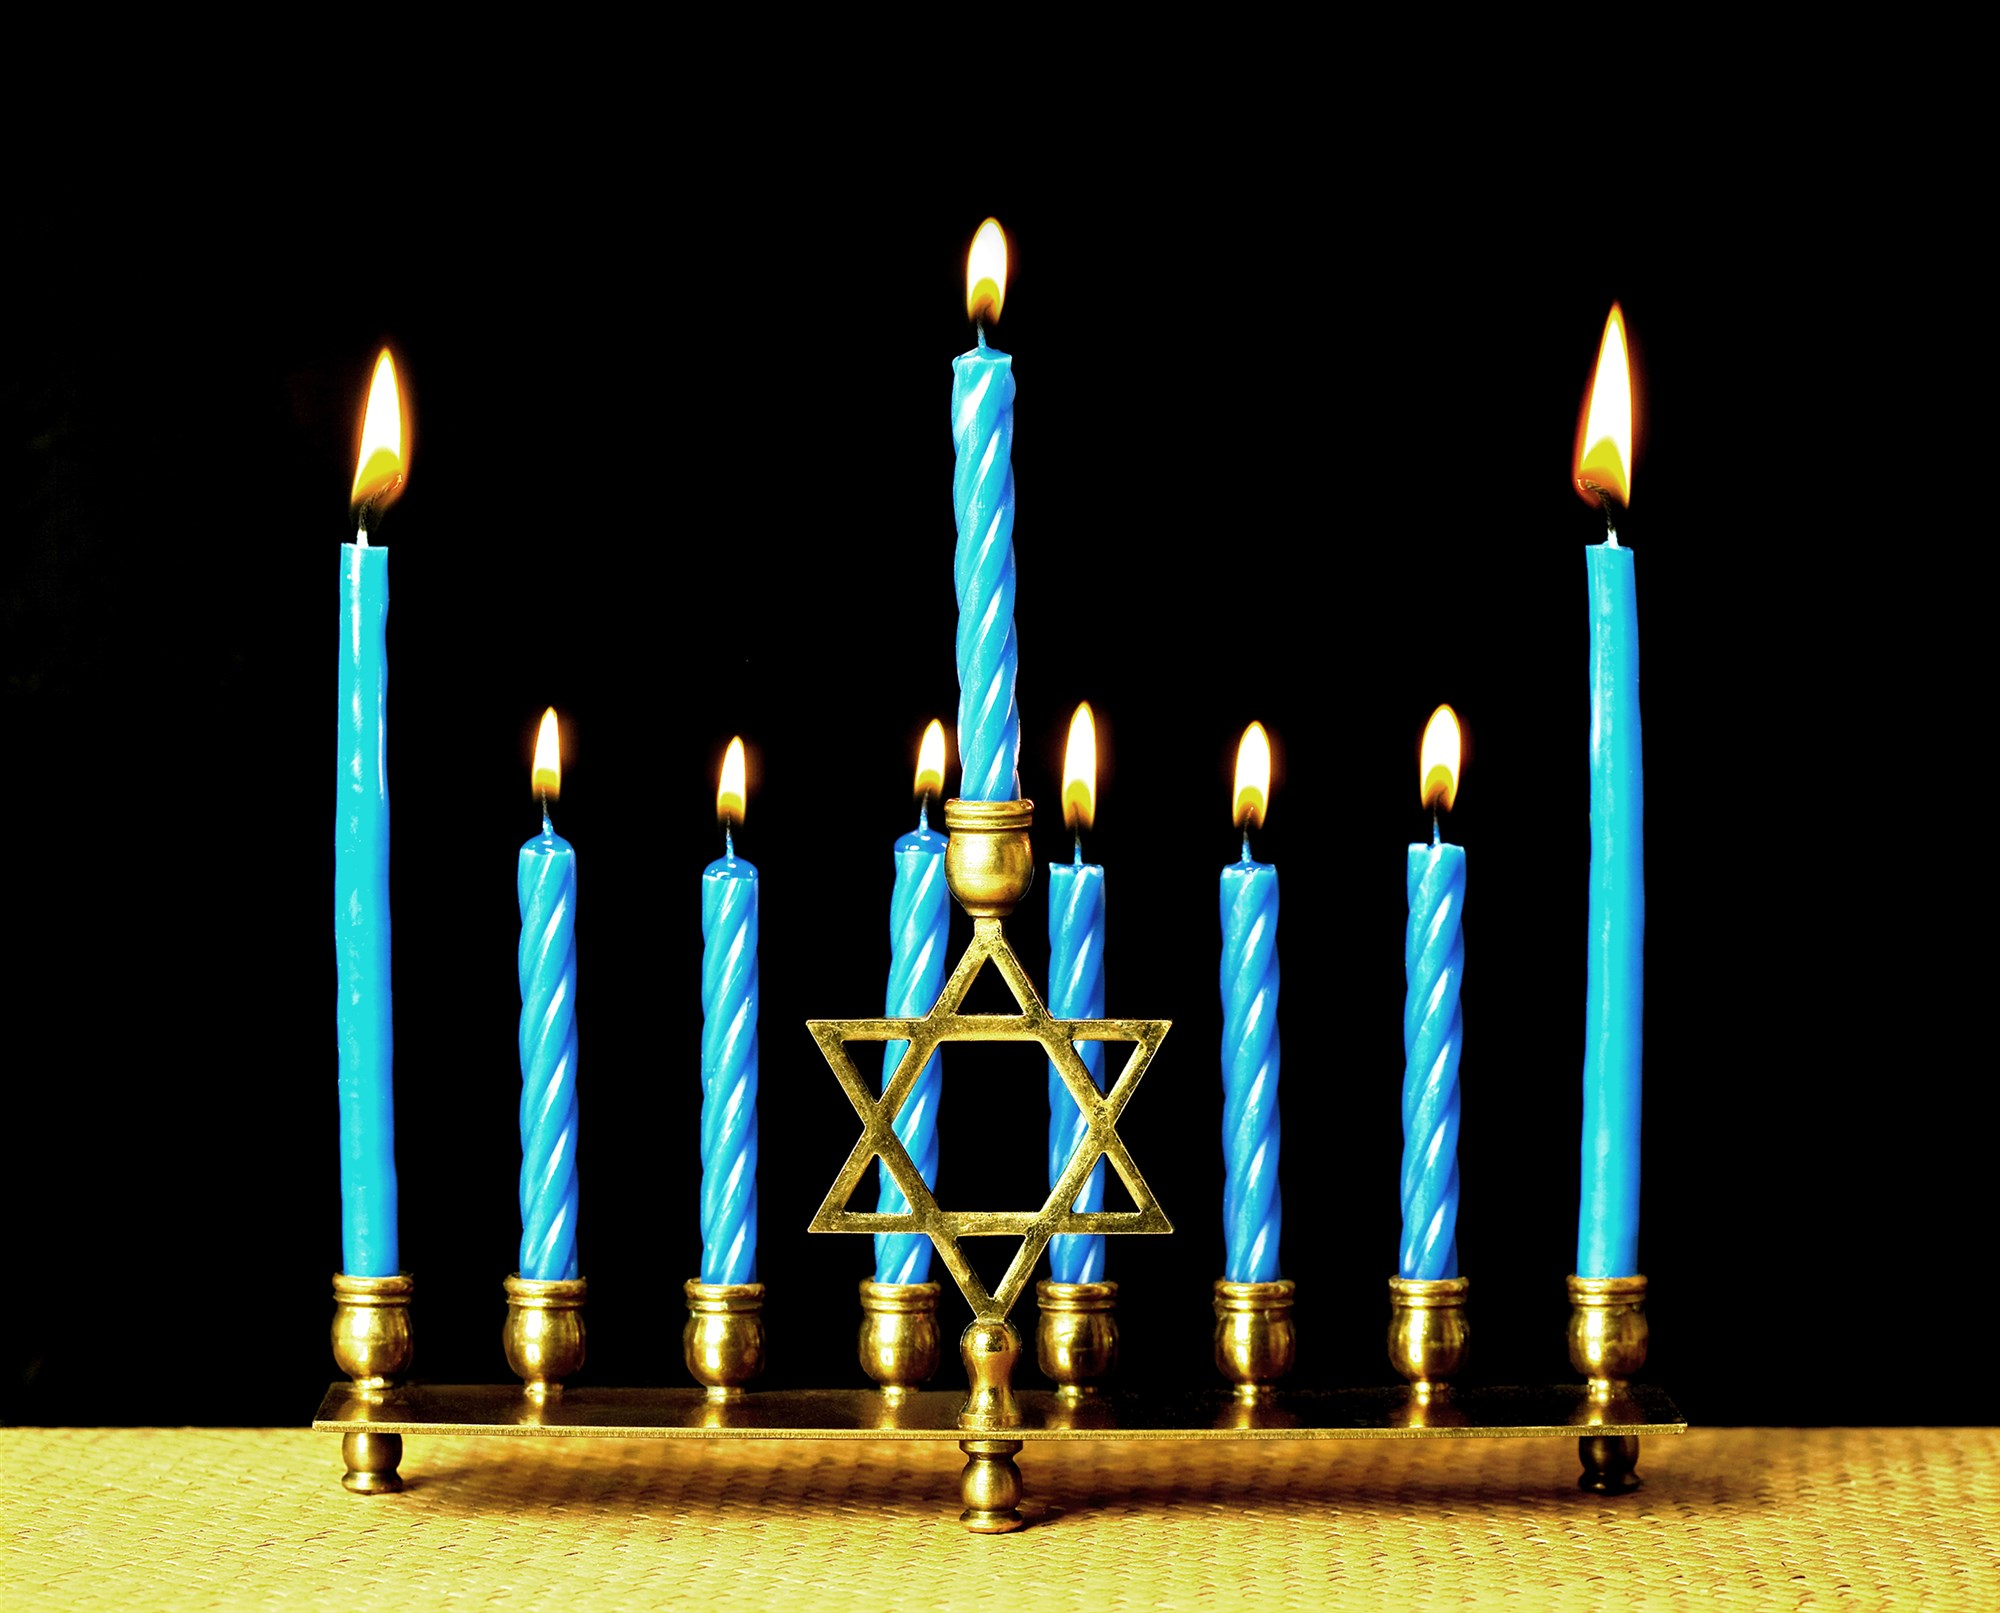 181207-jewish-menorah-hannukah-candles-ac-440p_3162bba88b0a77c4555ce7a66a346ff9.fit-2000w.jpg